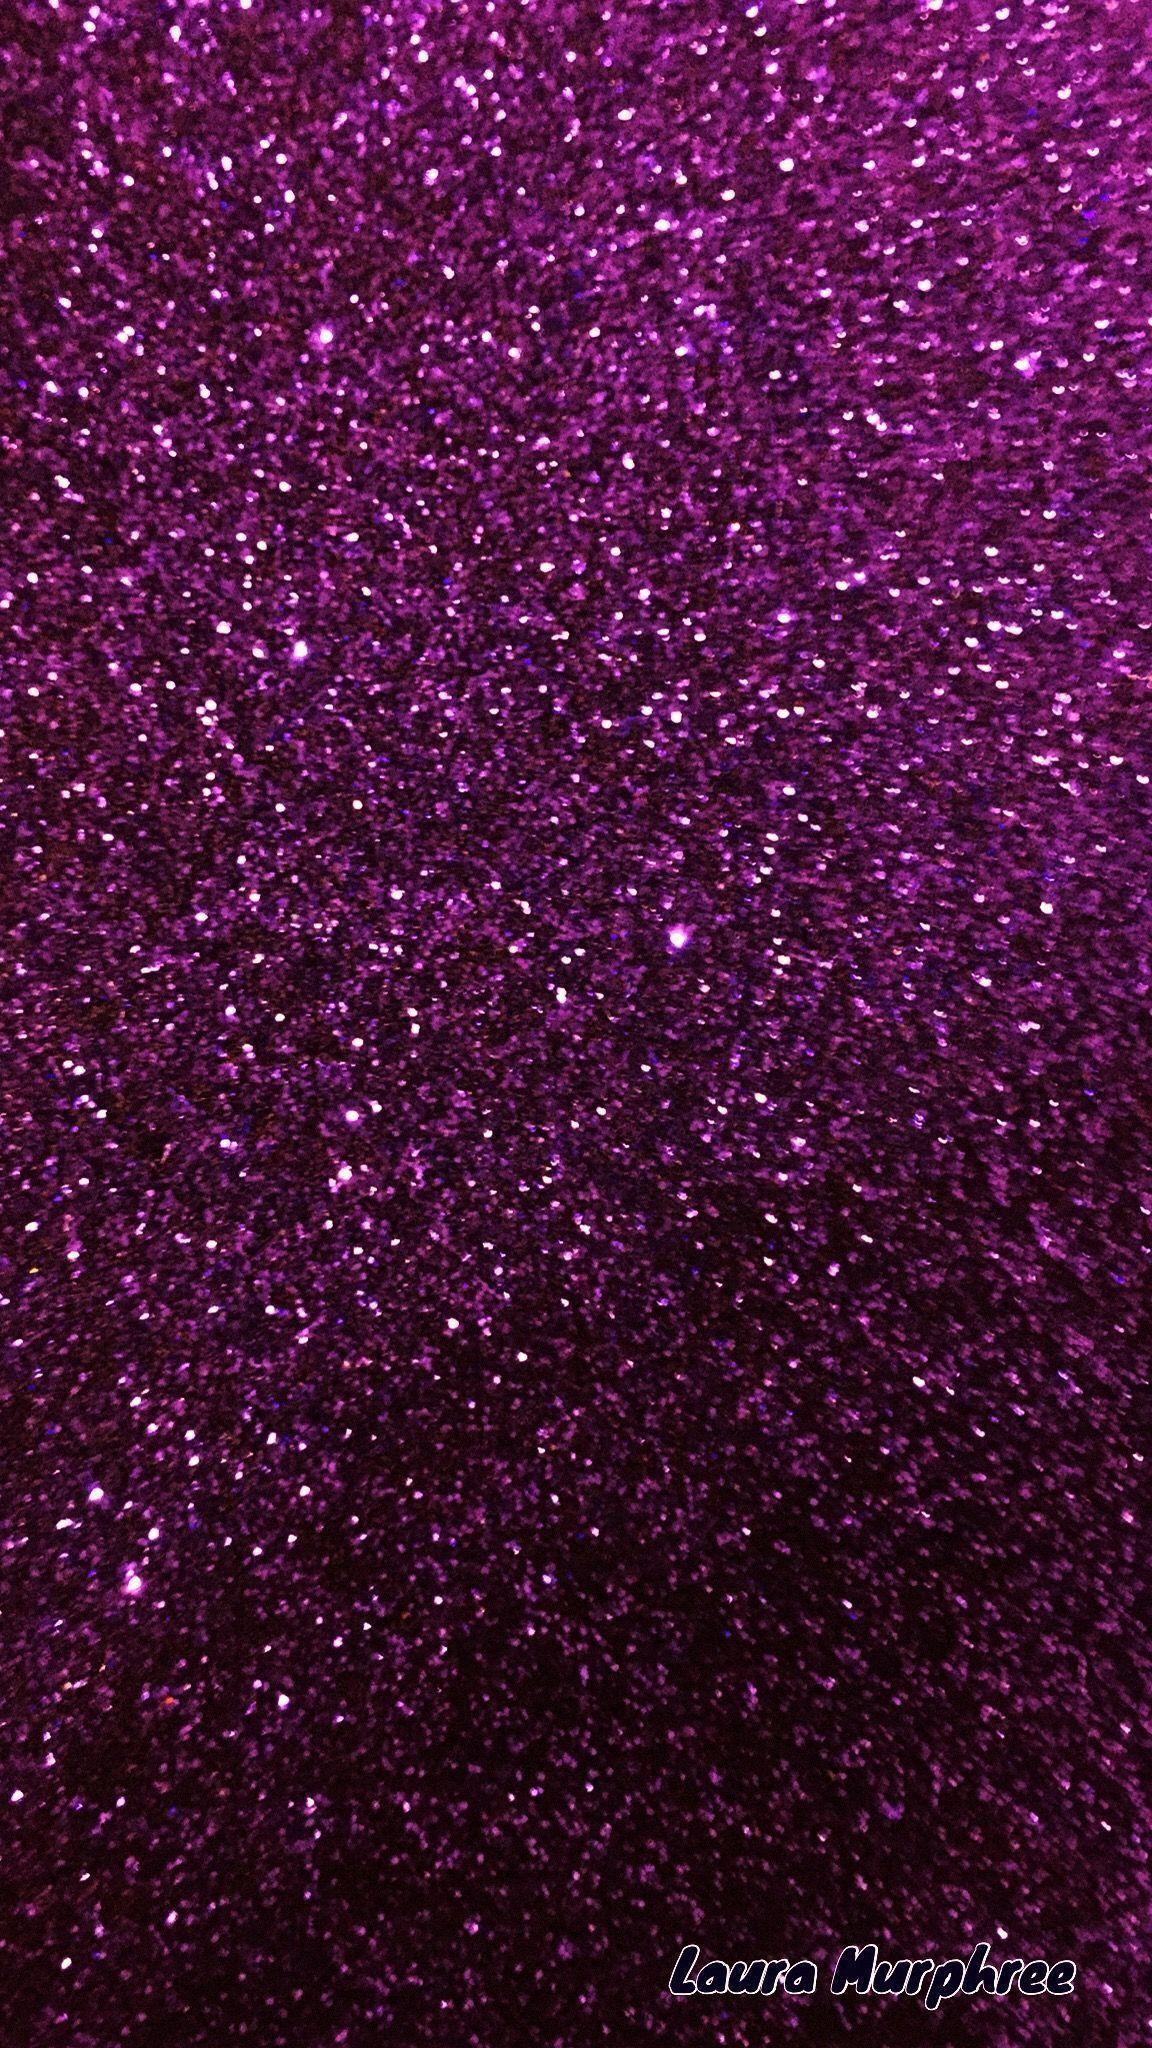 Cute Girly Glitter Wallpaper Glitter Phone Wallpaper Sparkle Background Pretty Girly